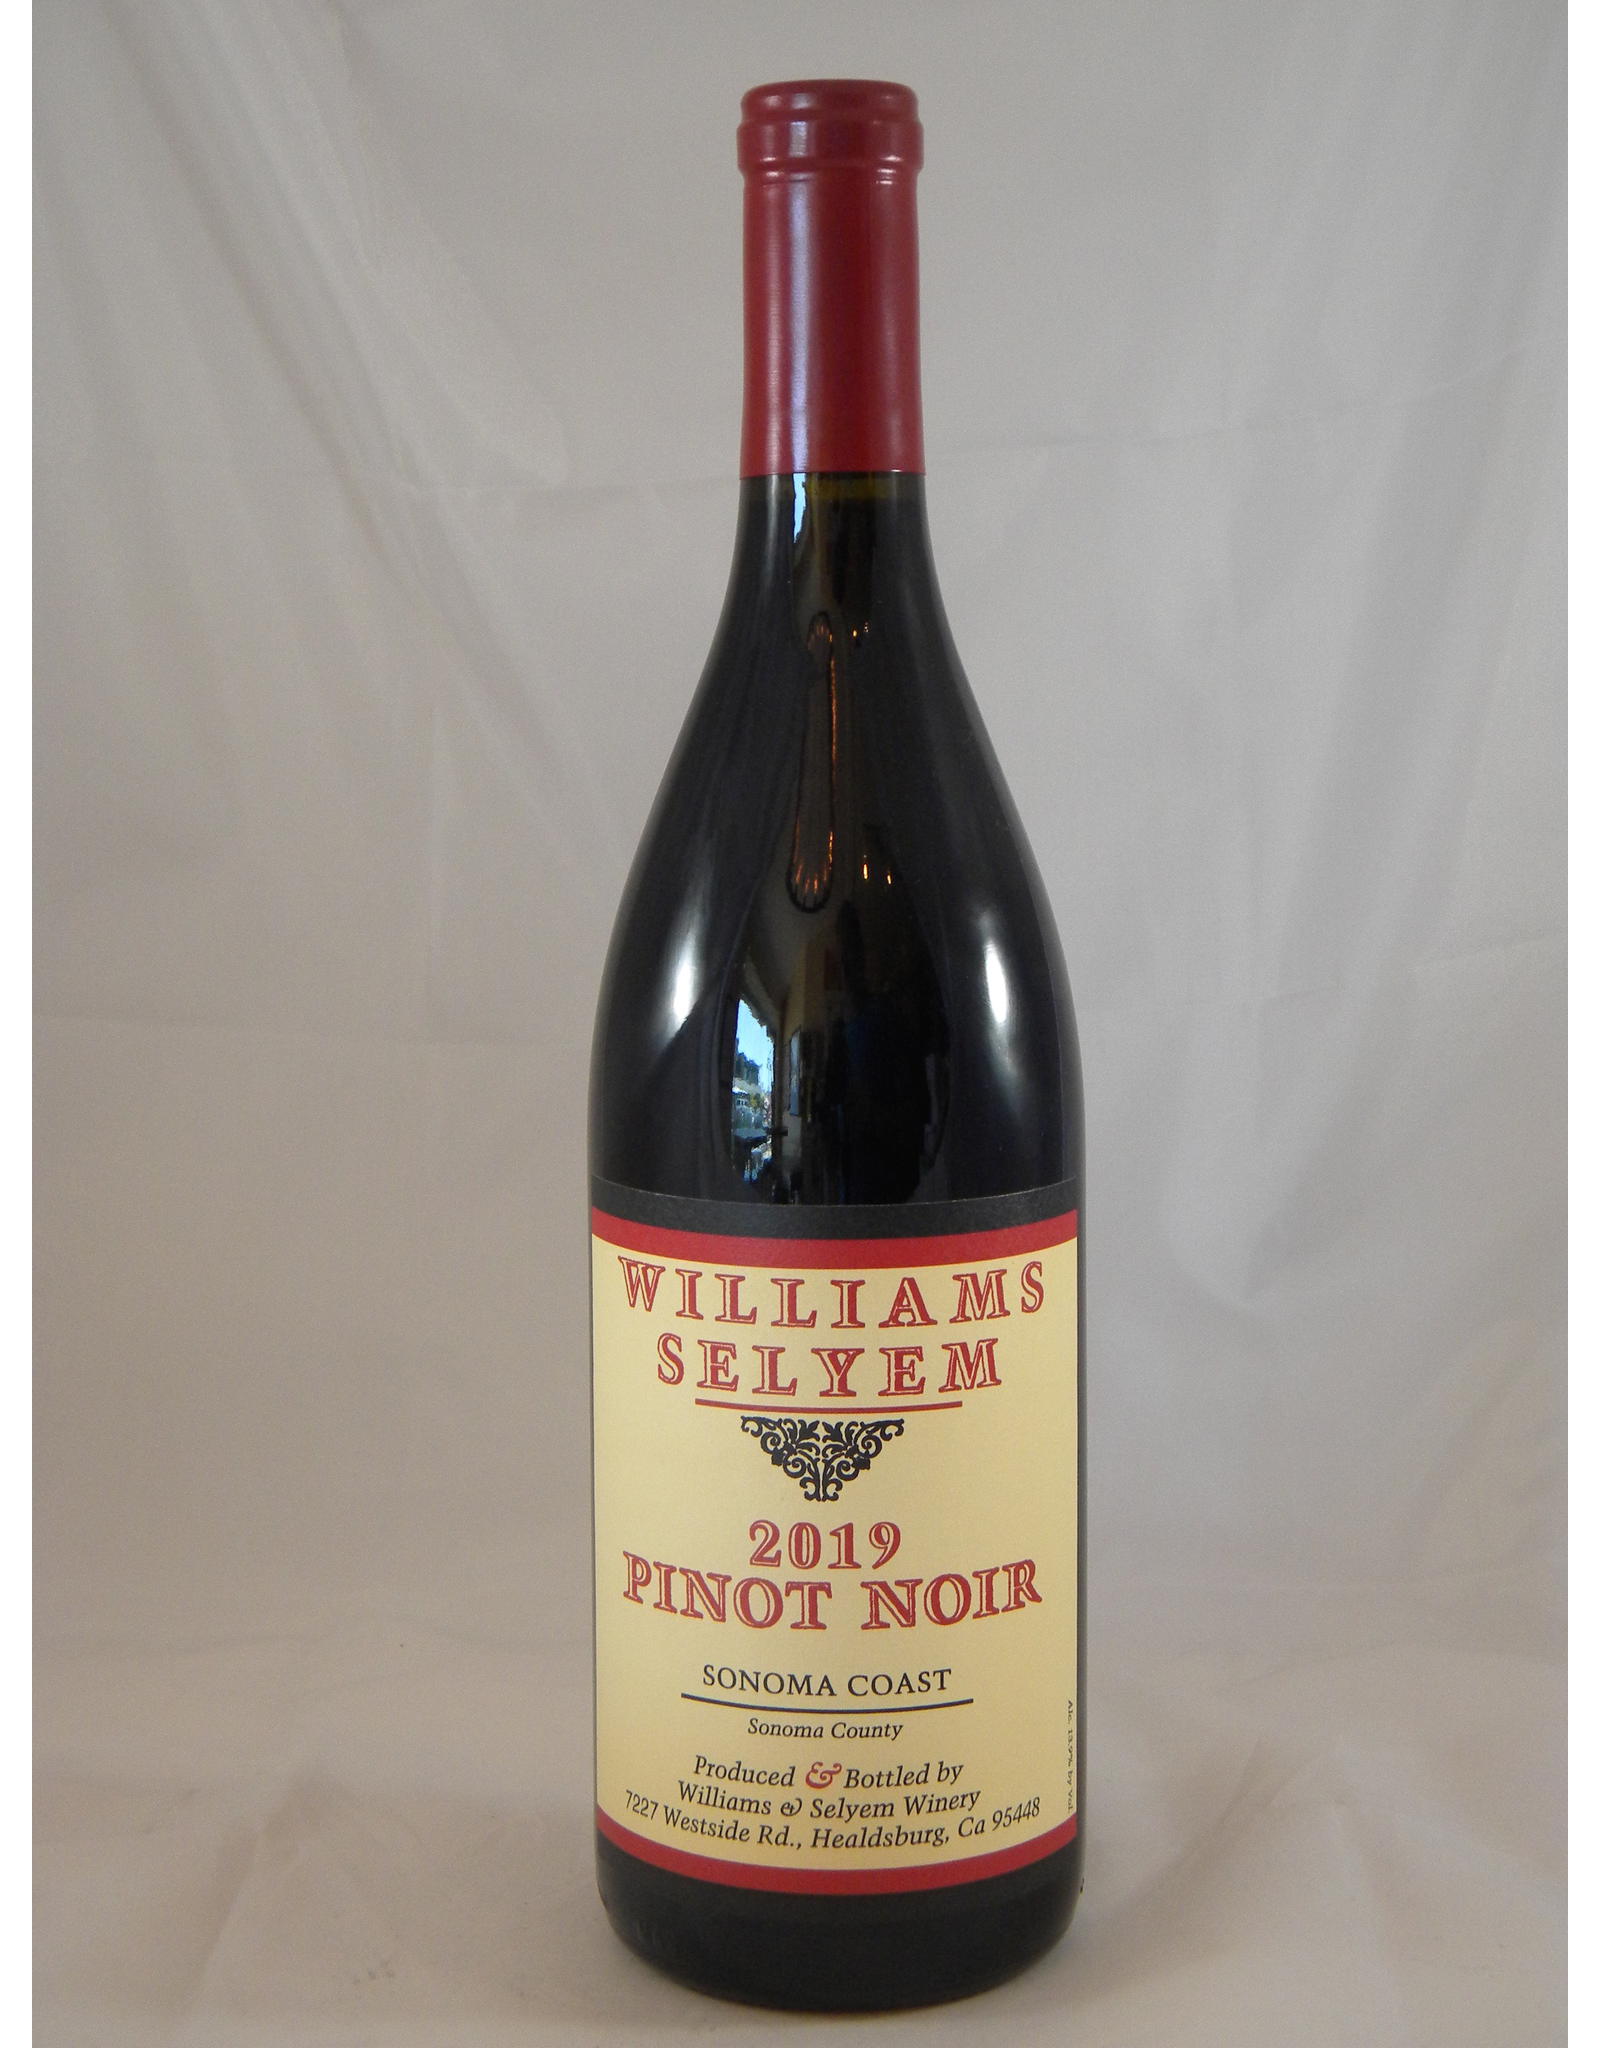 Williams Selyem Williams Selyem Pinot Noir Sonoma Coast 2019